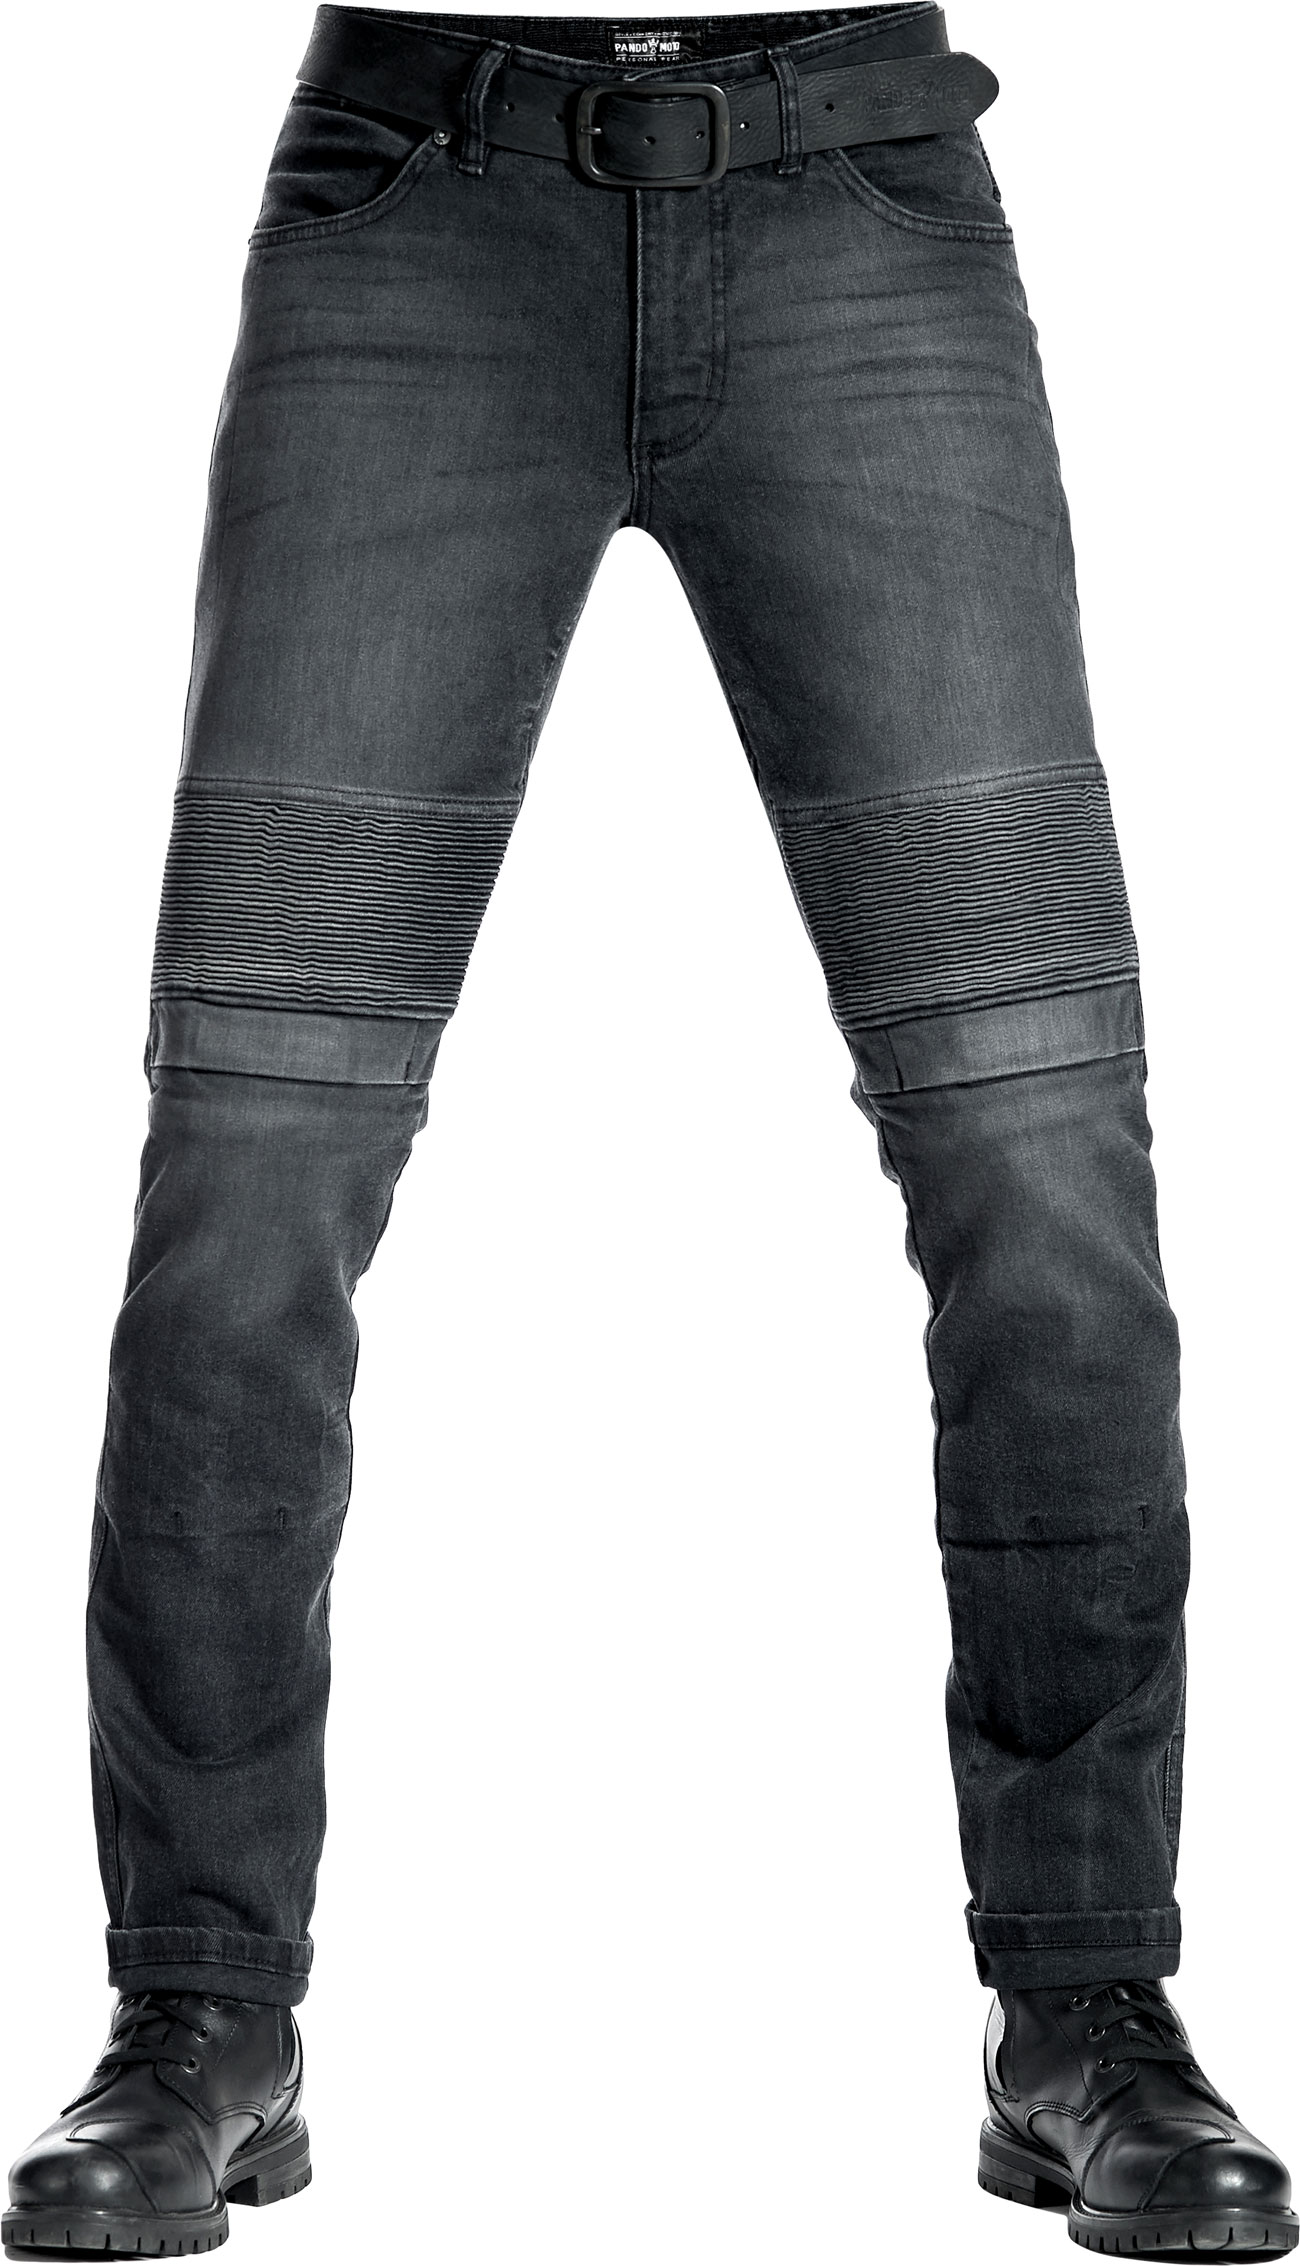 Pando Moto Karl Devil 9, Jeans - Dunkelgrau - W34/L34 PM-19-Karl-Devil-1-W34-